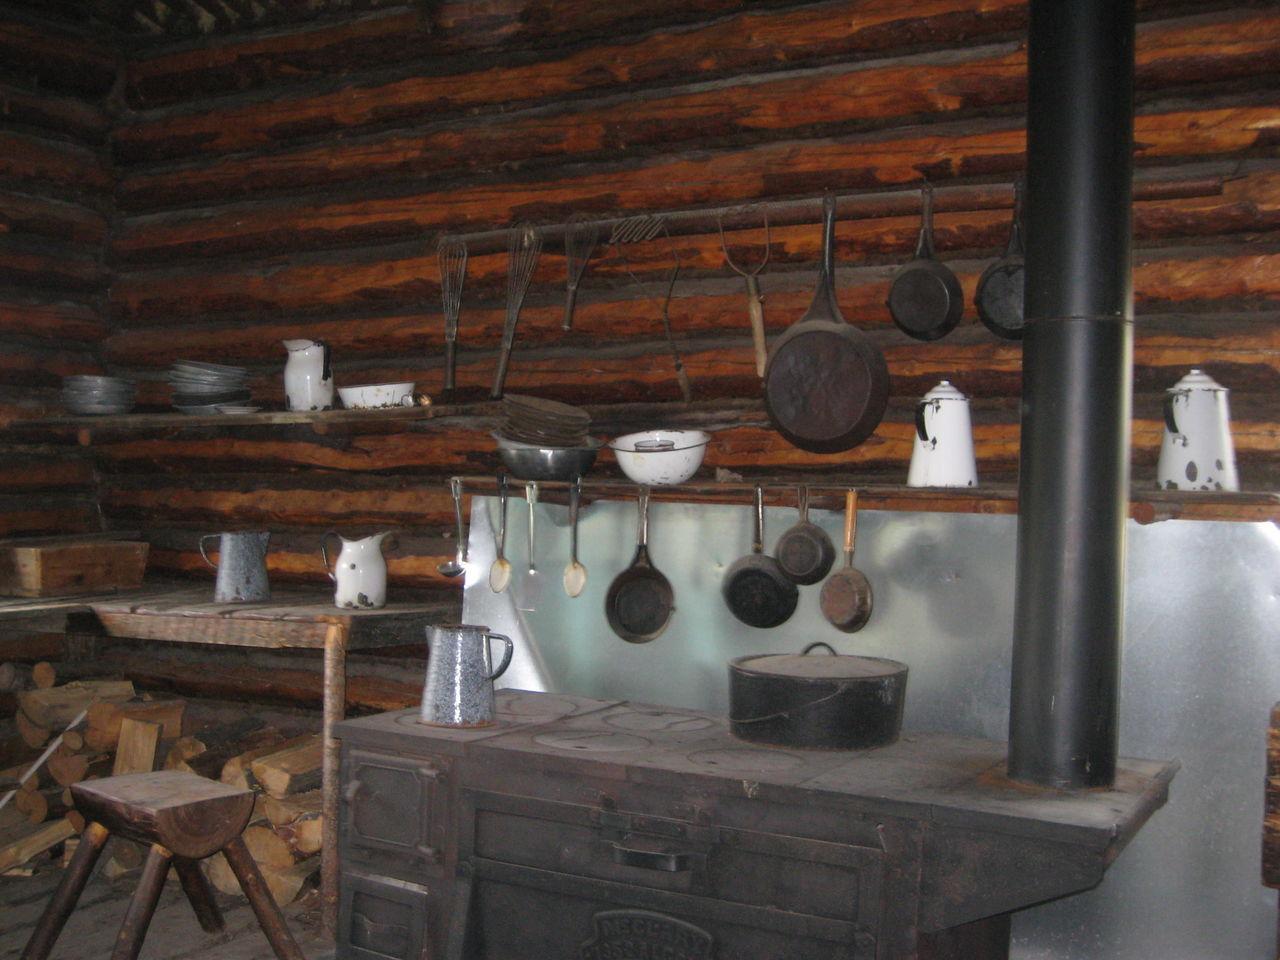 Interior Of Old Kitchen